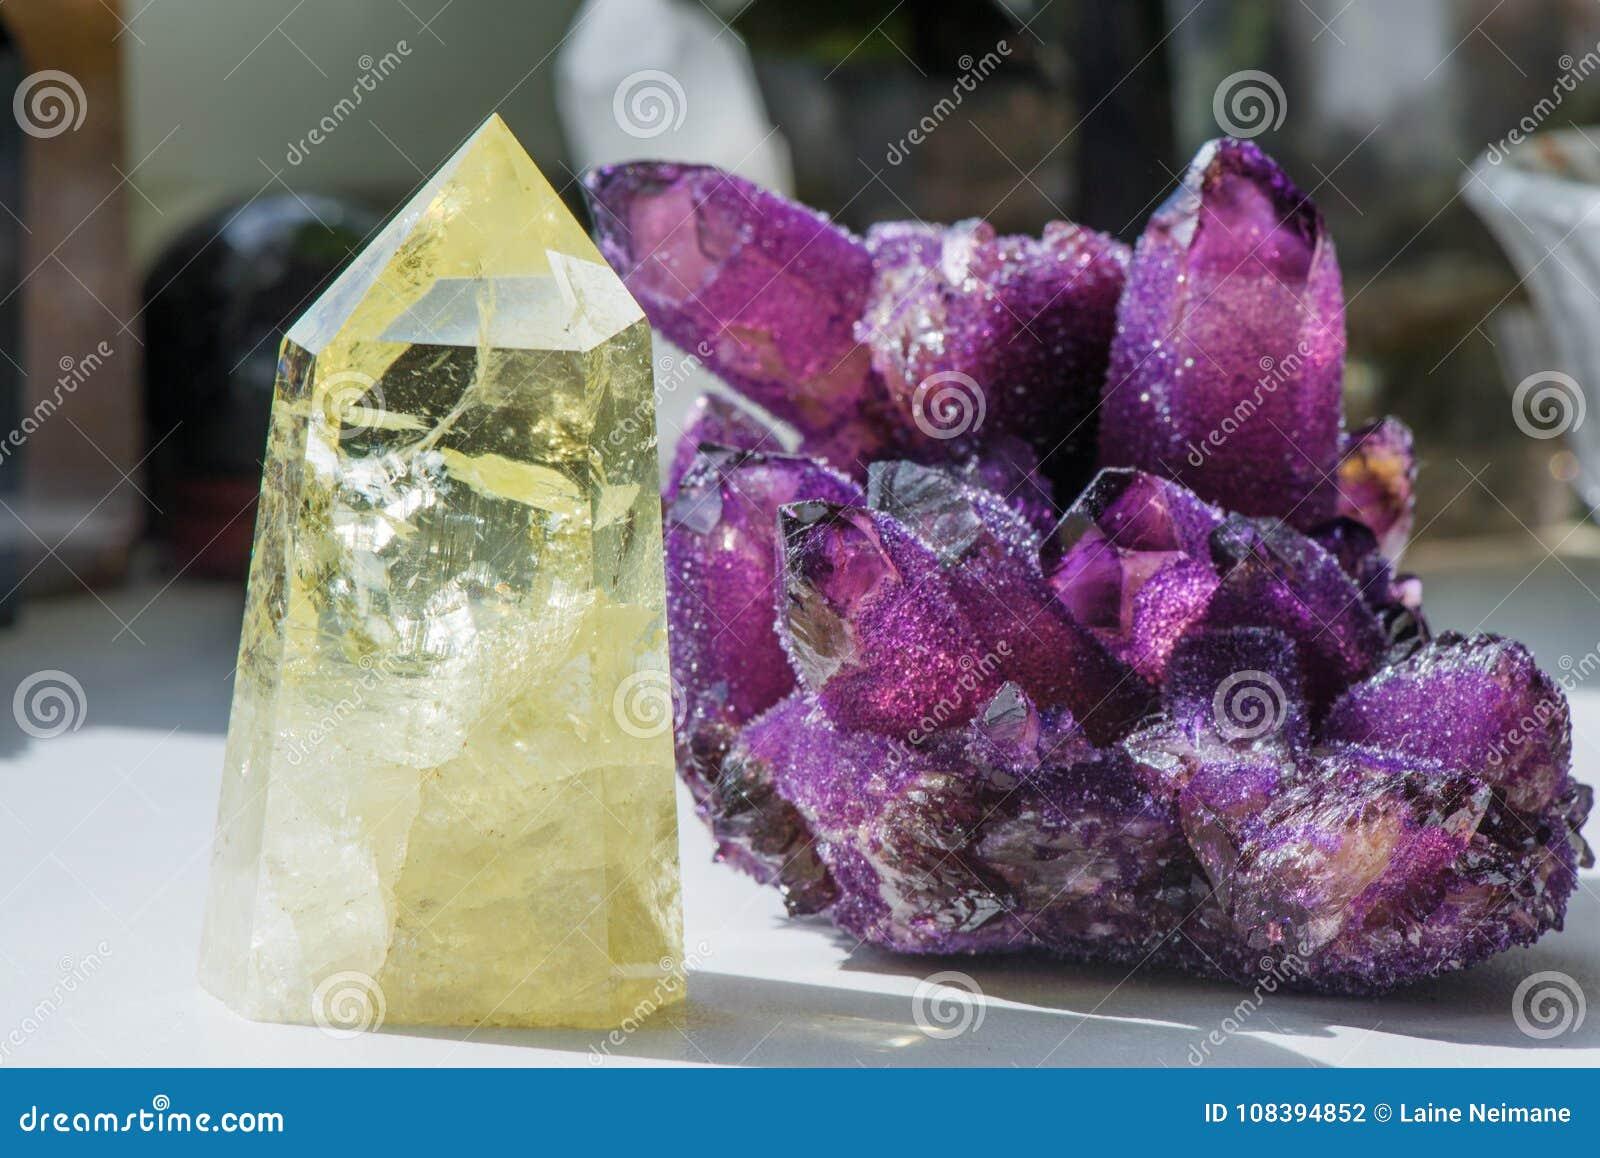 Citrine stone and amethyst.